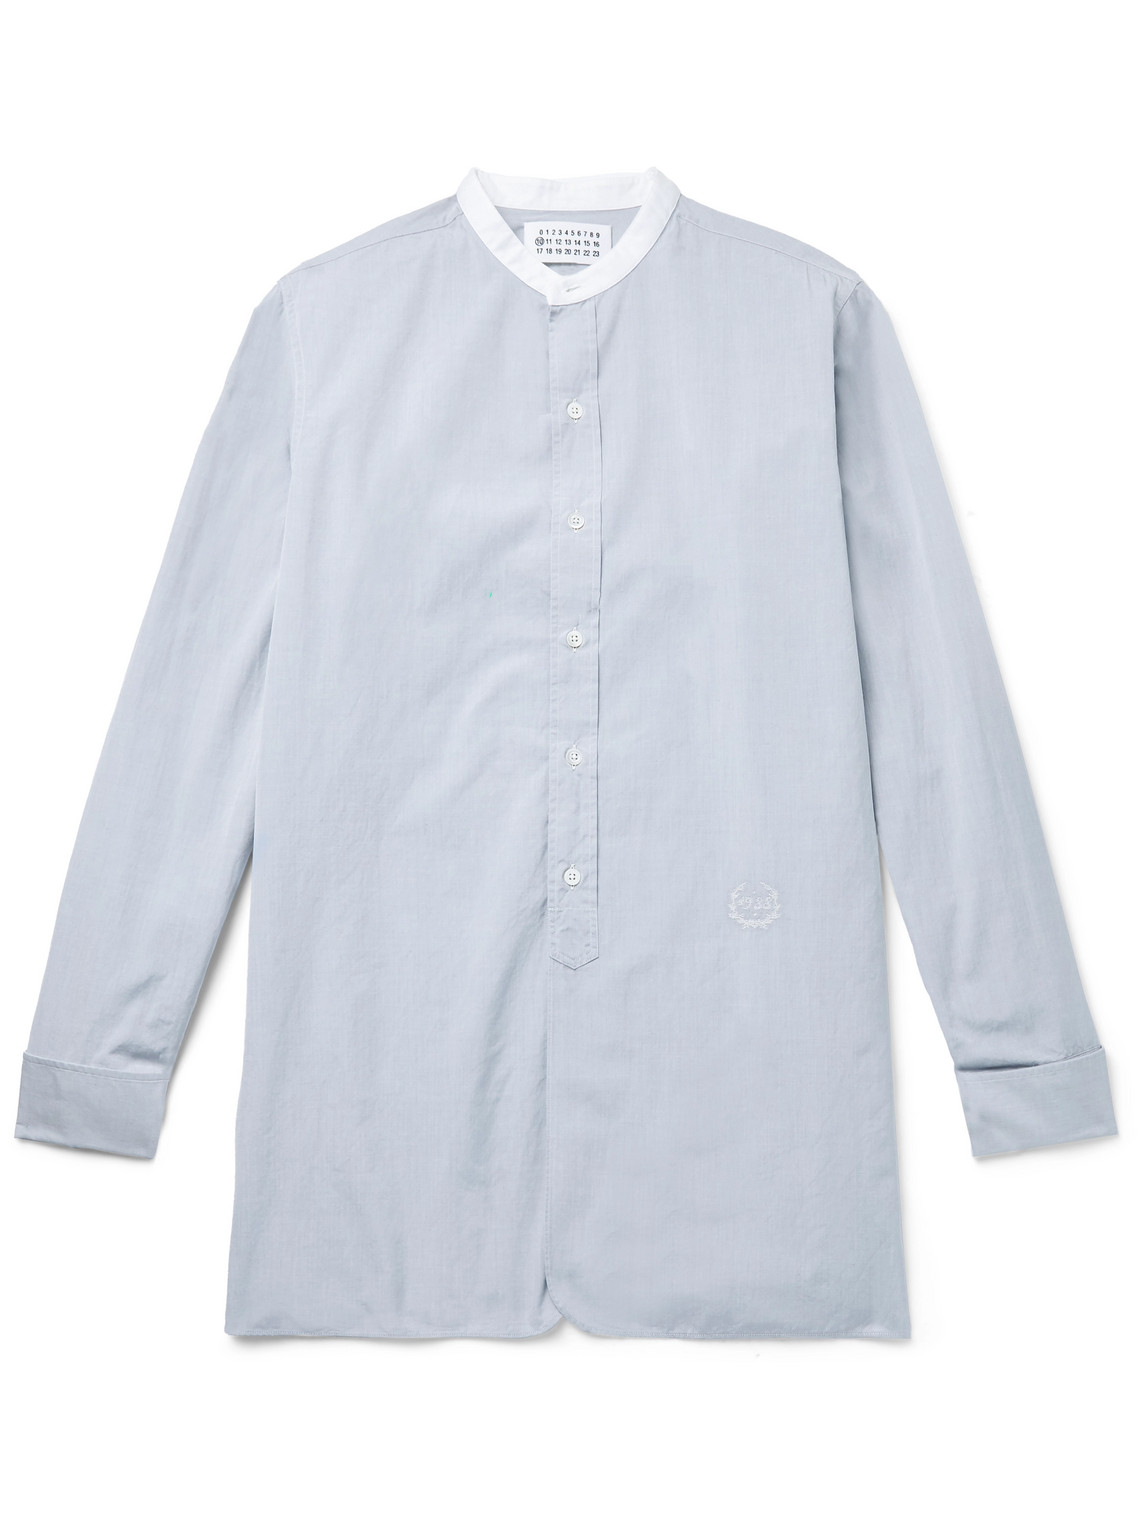 maison margiela - grandad-collar embroidered cotton-poplin shirt - men - gray - eu 41